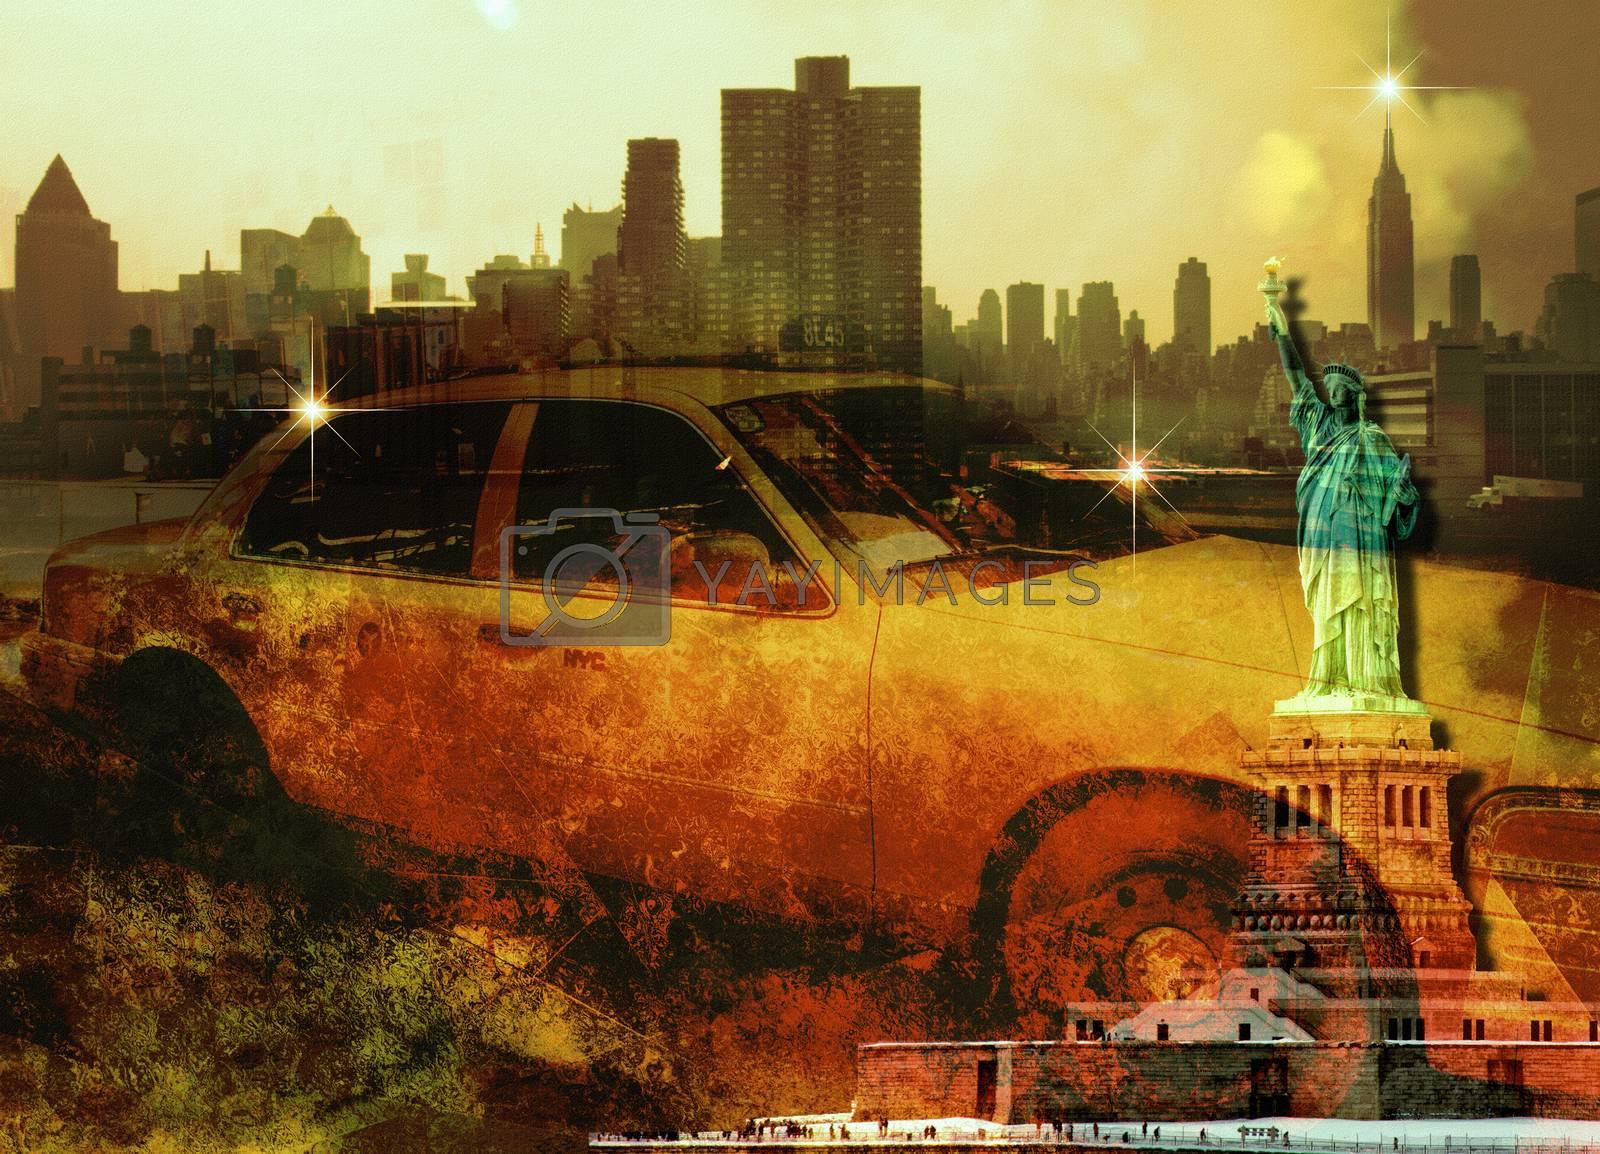 New York Yellow Cab. Liberty Statue. Manhattan skyline